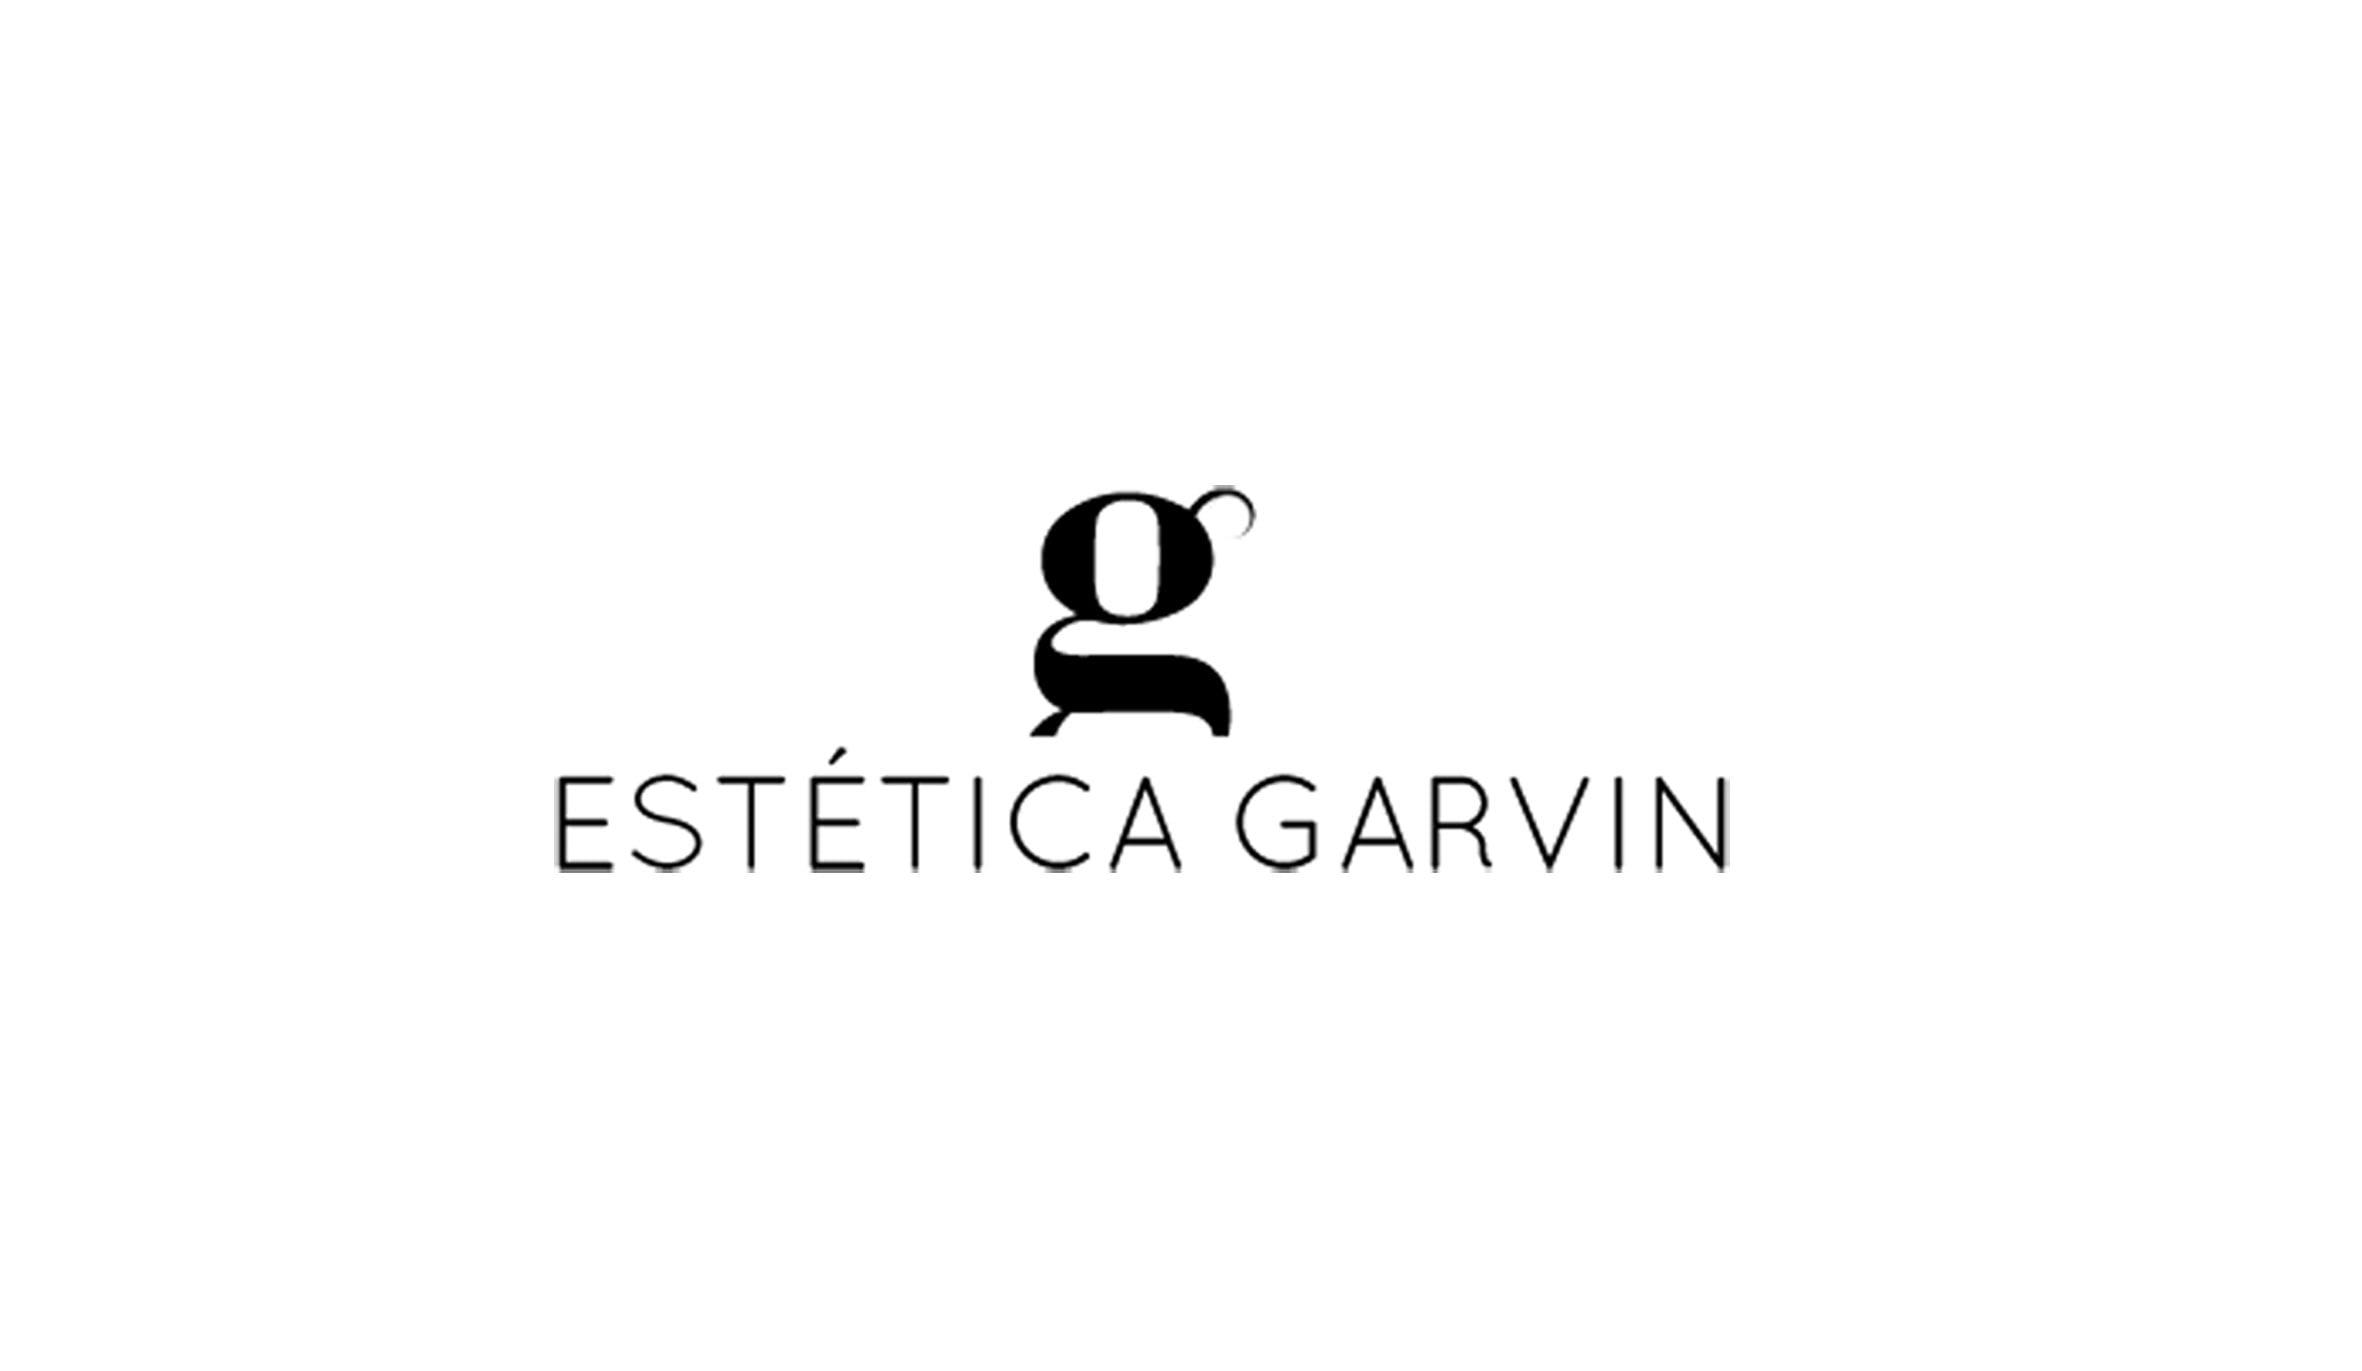 Estética Garvin